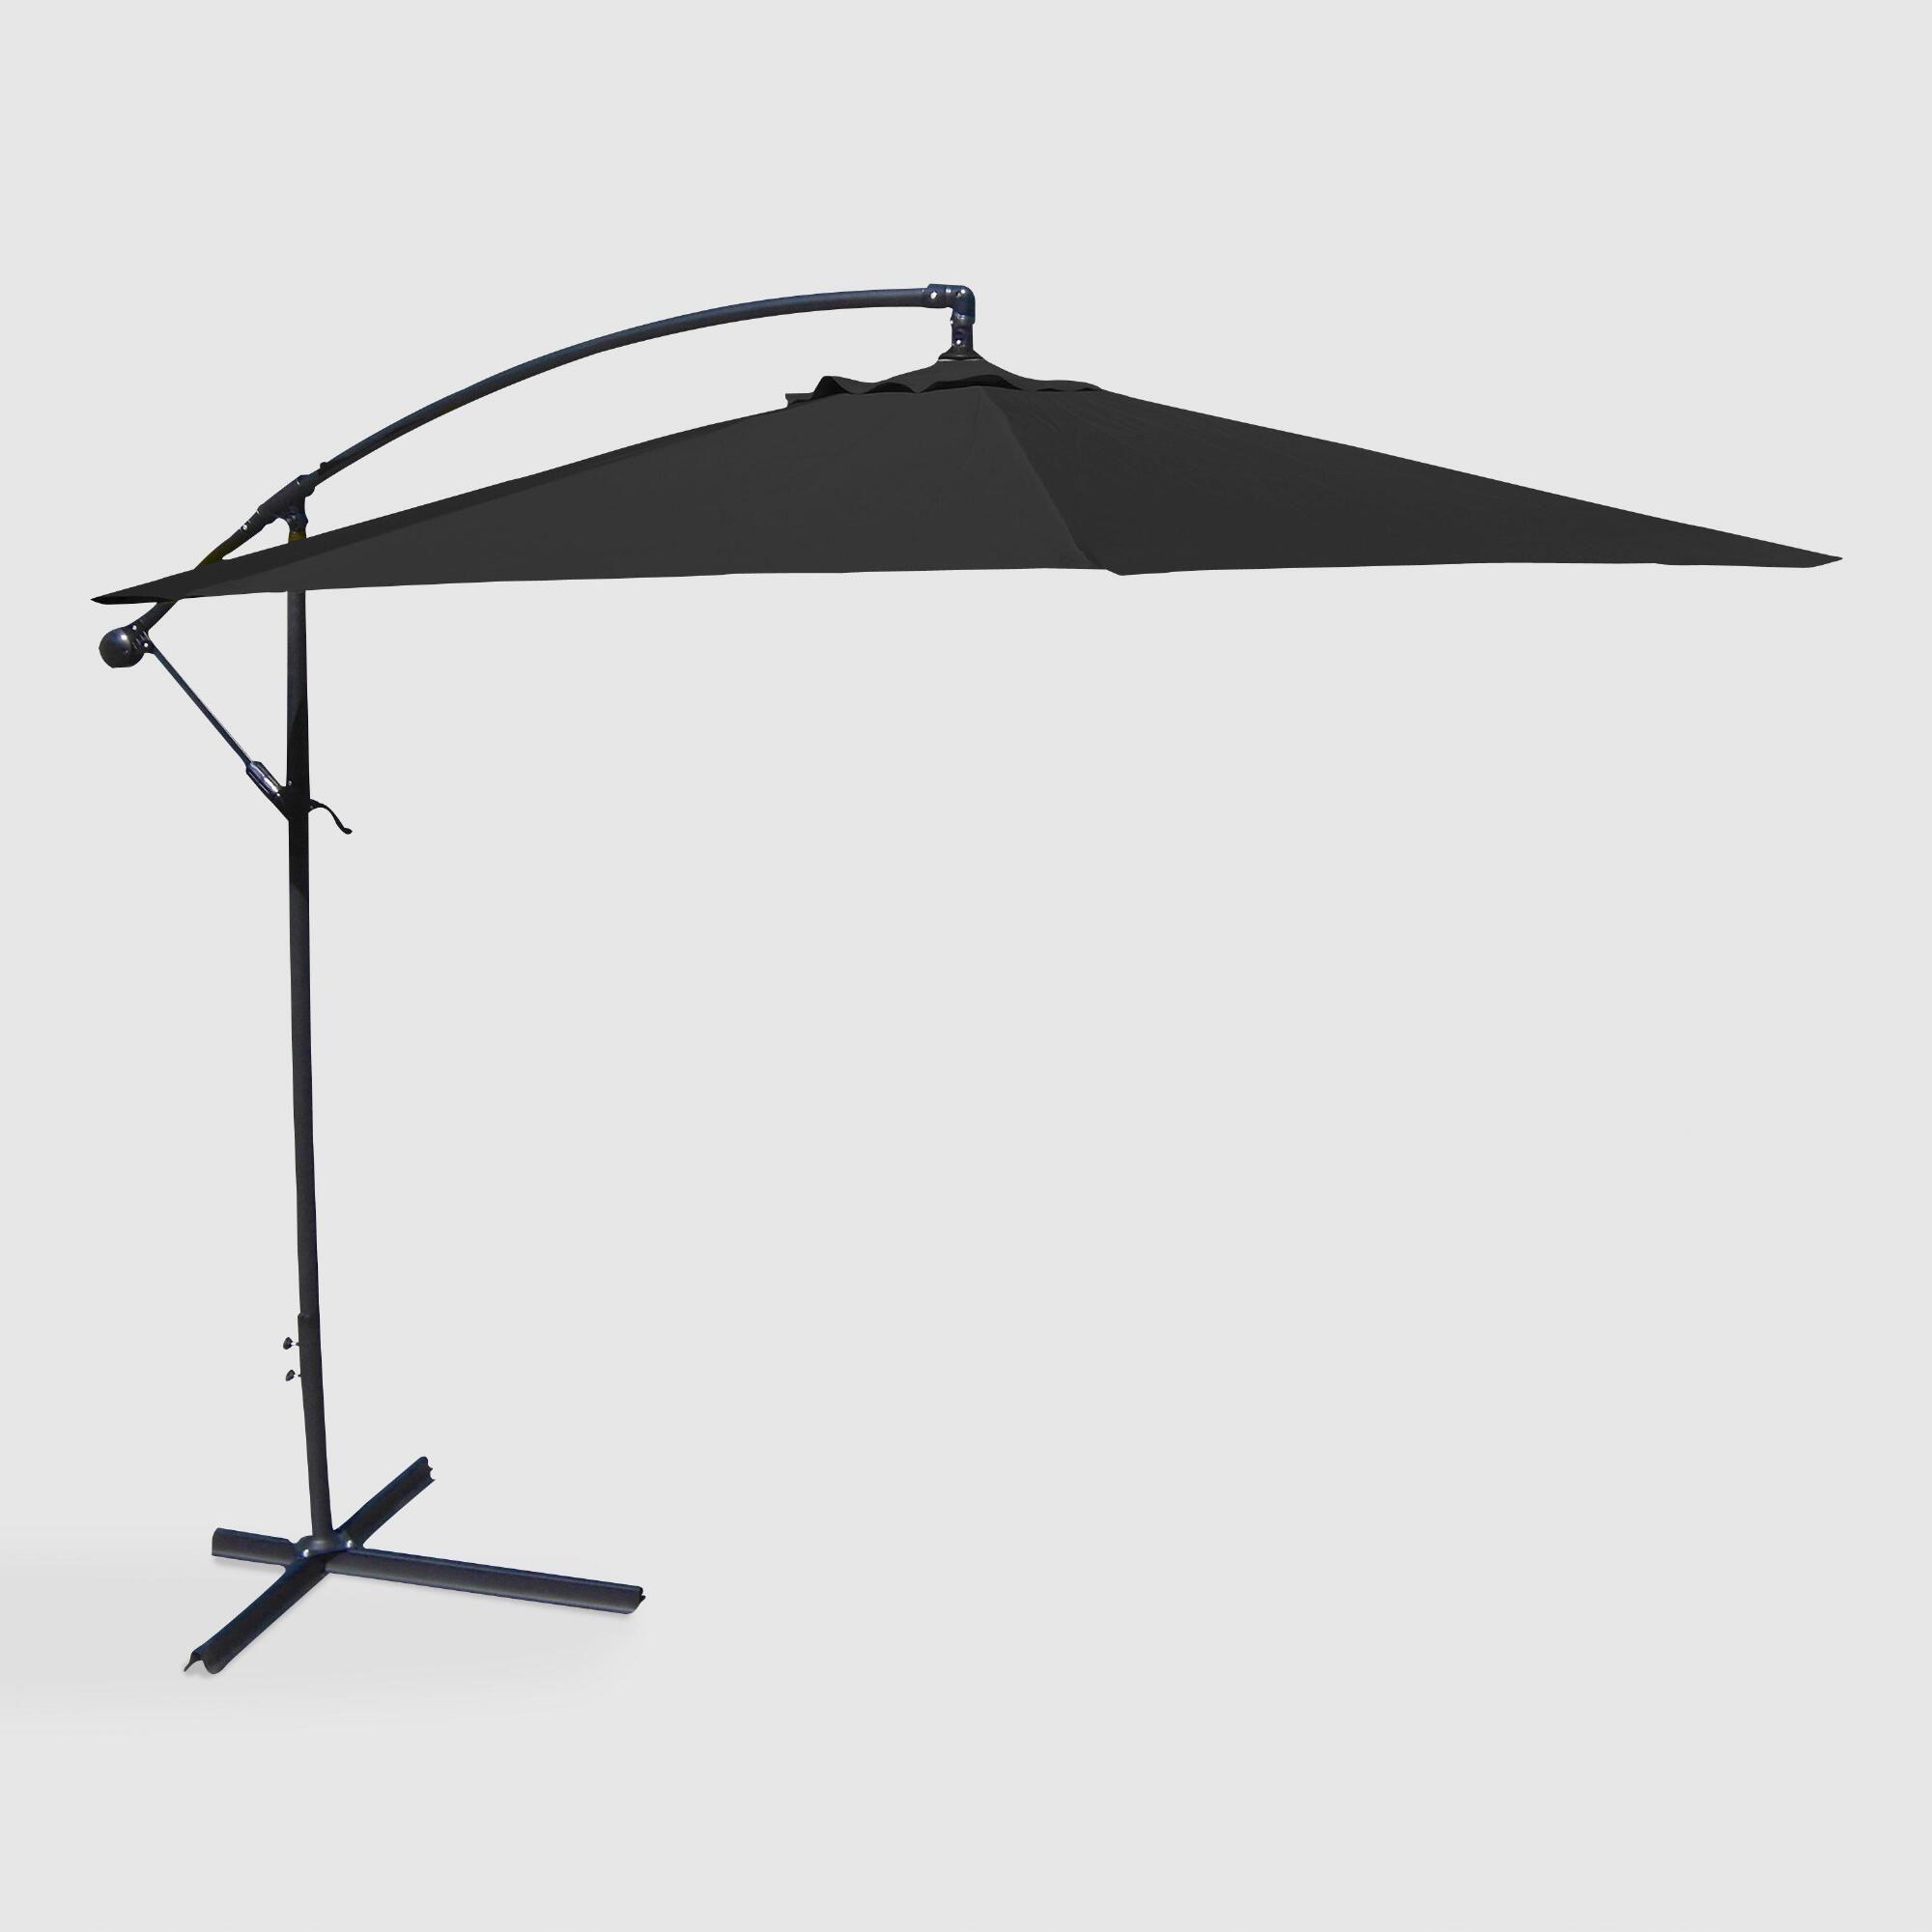 Black Cantilever Outdoor Patio Umbrella Fabric By World